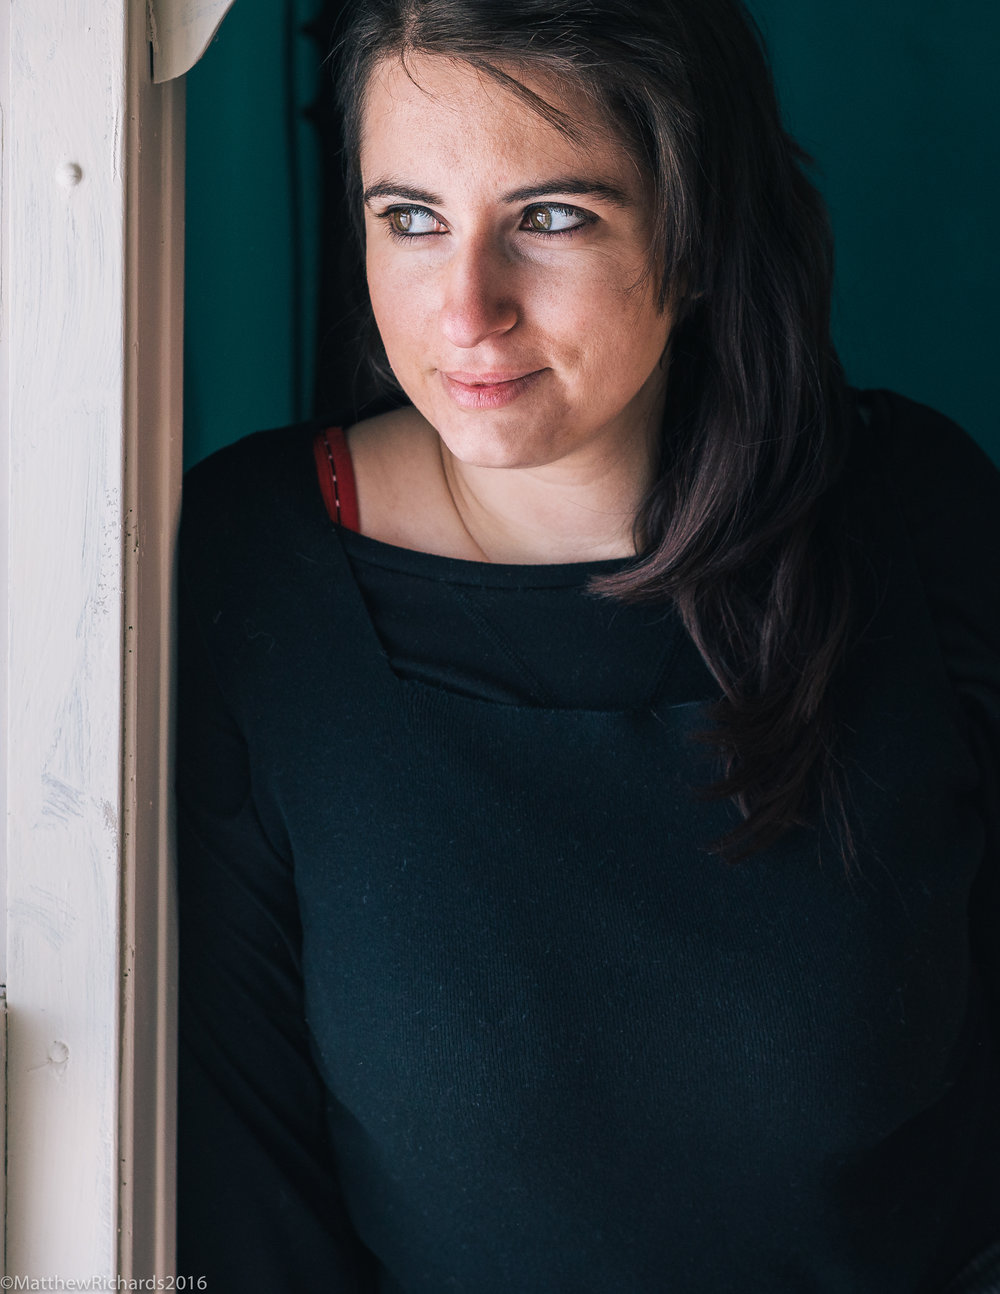 portrait-felicia